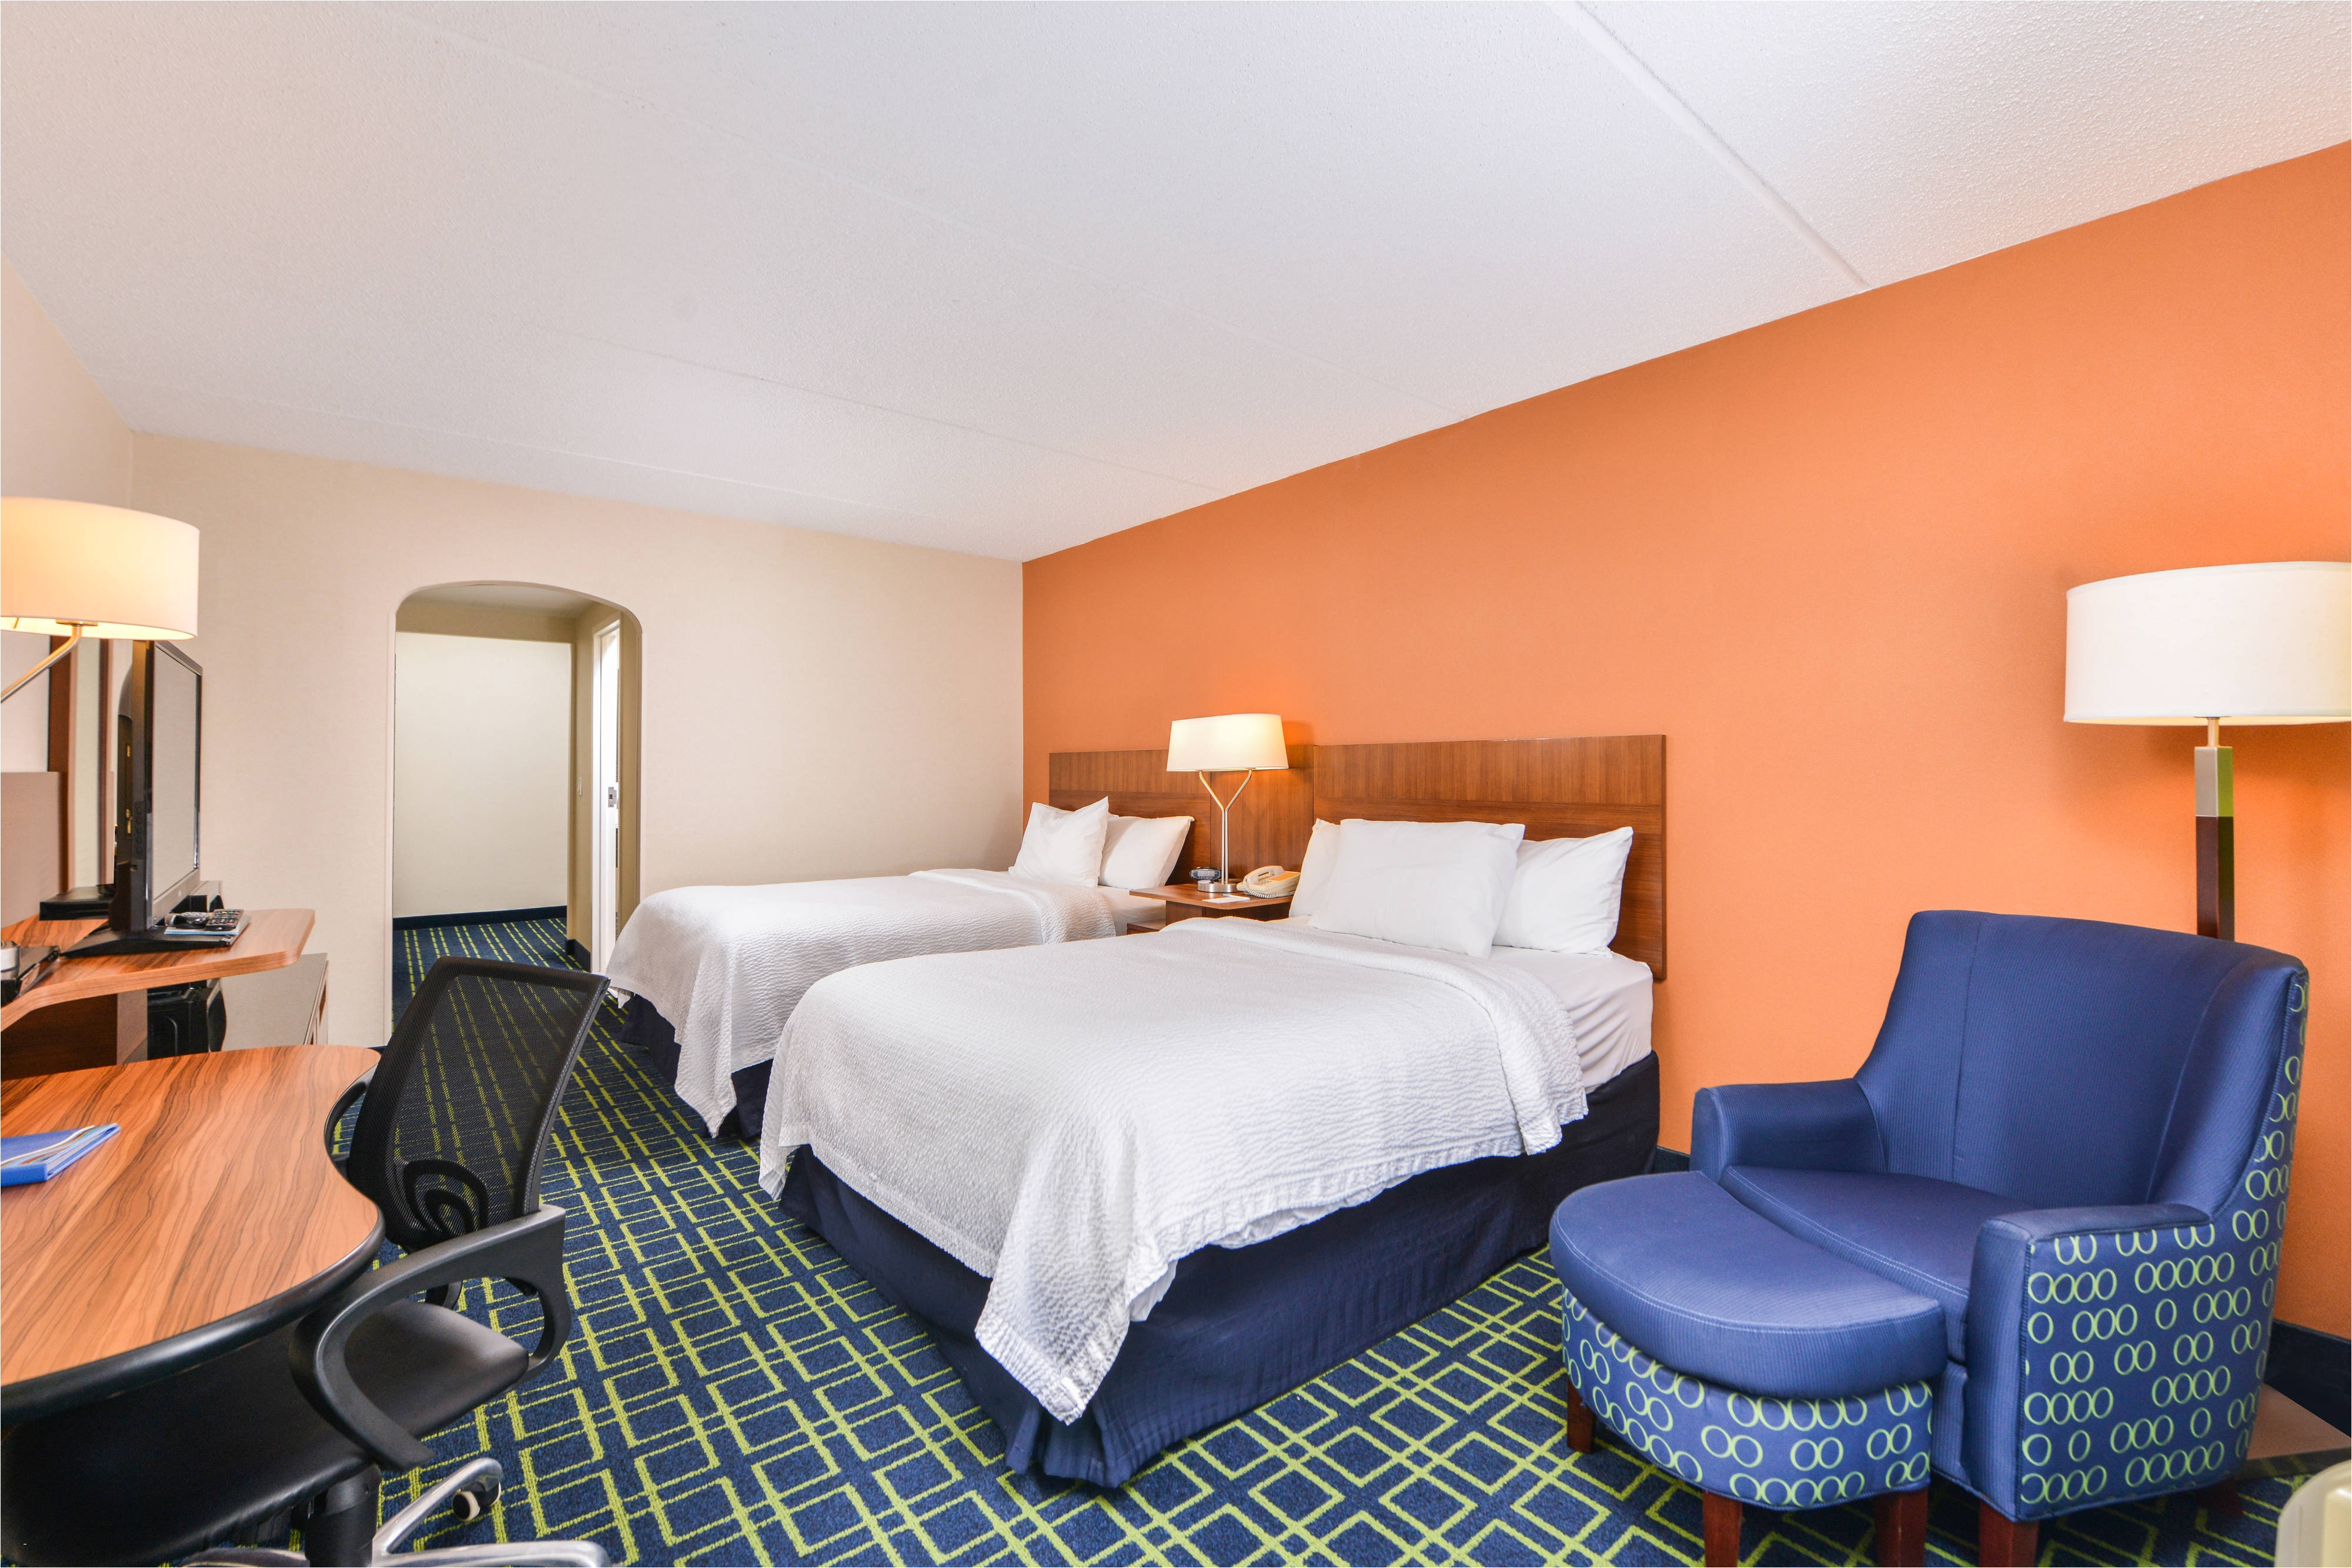 2 bedroom suites orlando fl awesome lovable 2 bedroom suites in orlando bemalas